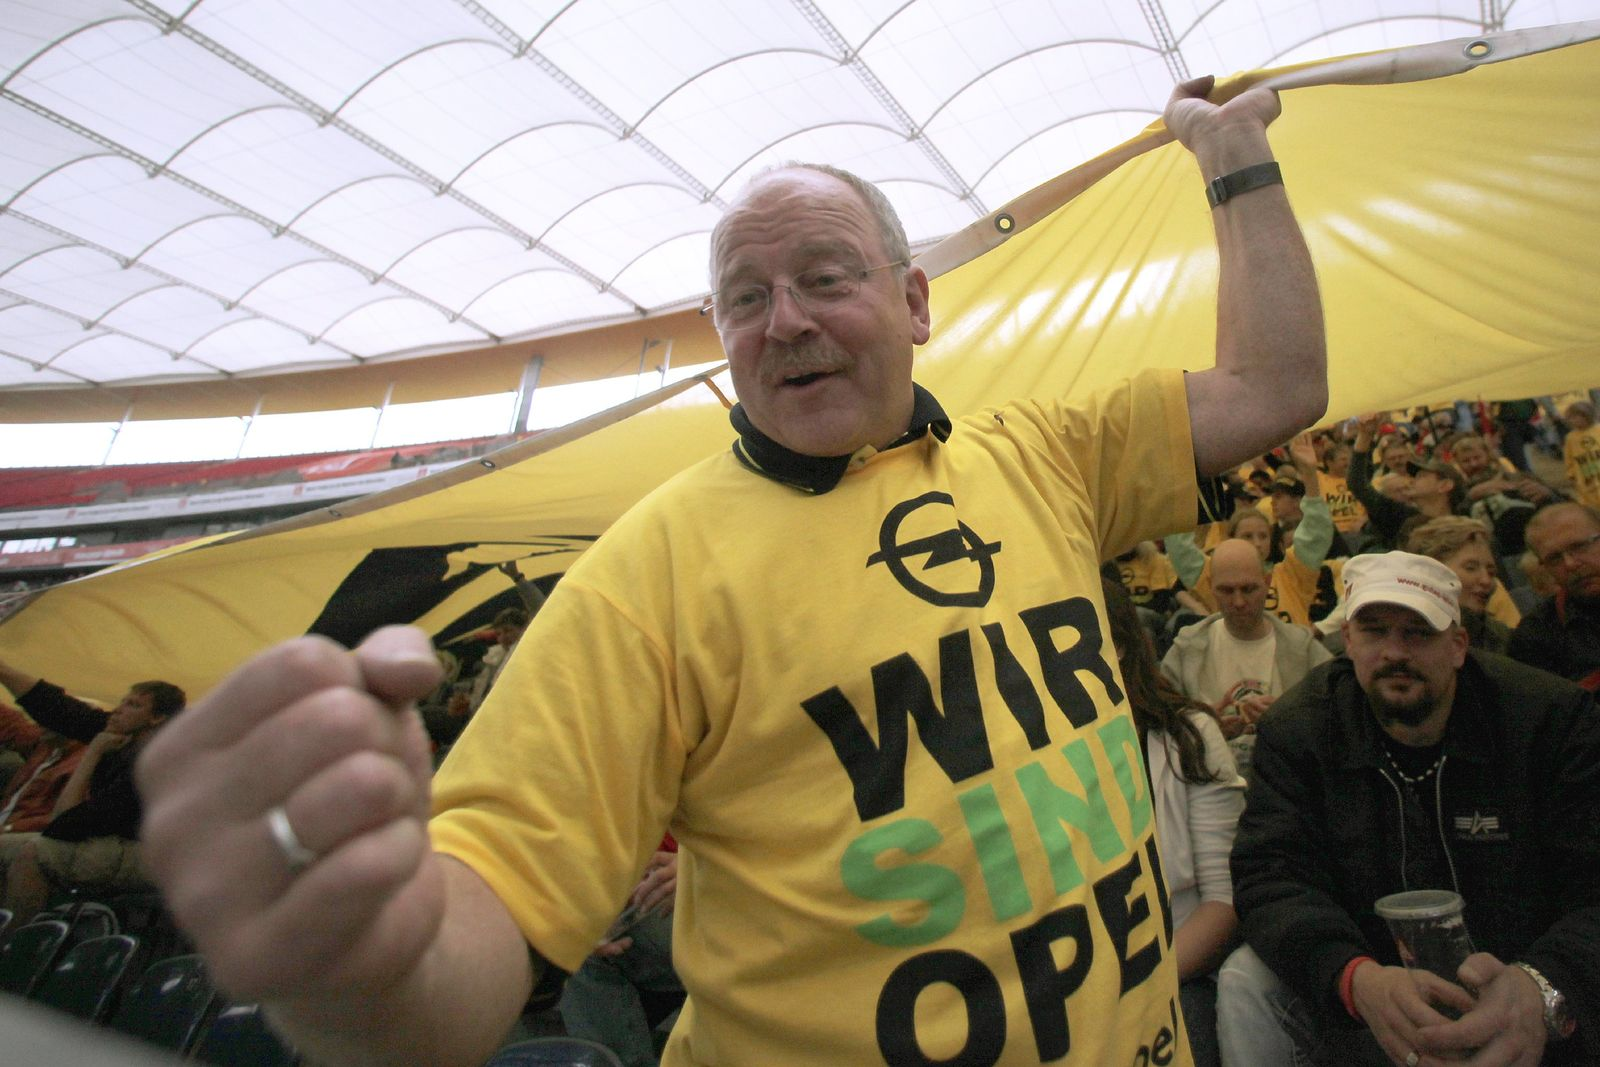 Opel / Klaus Franz